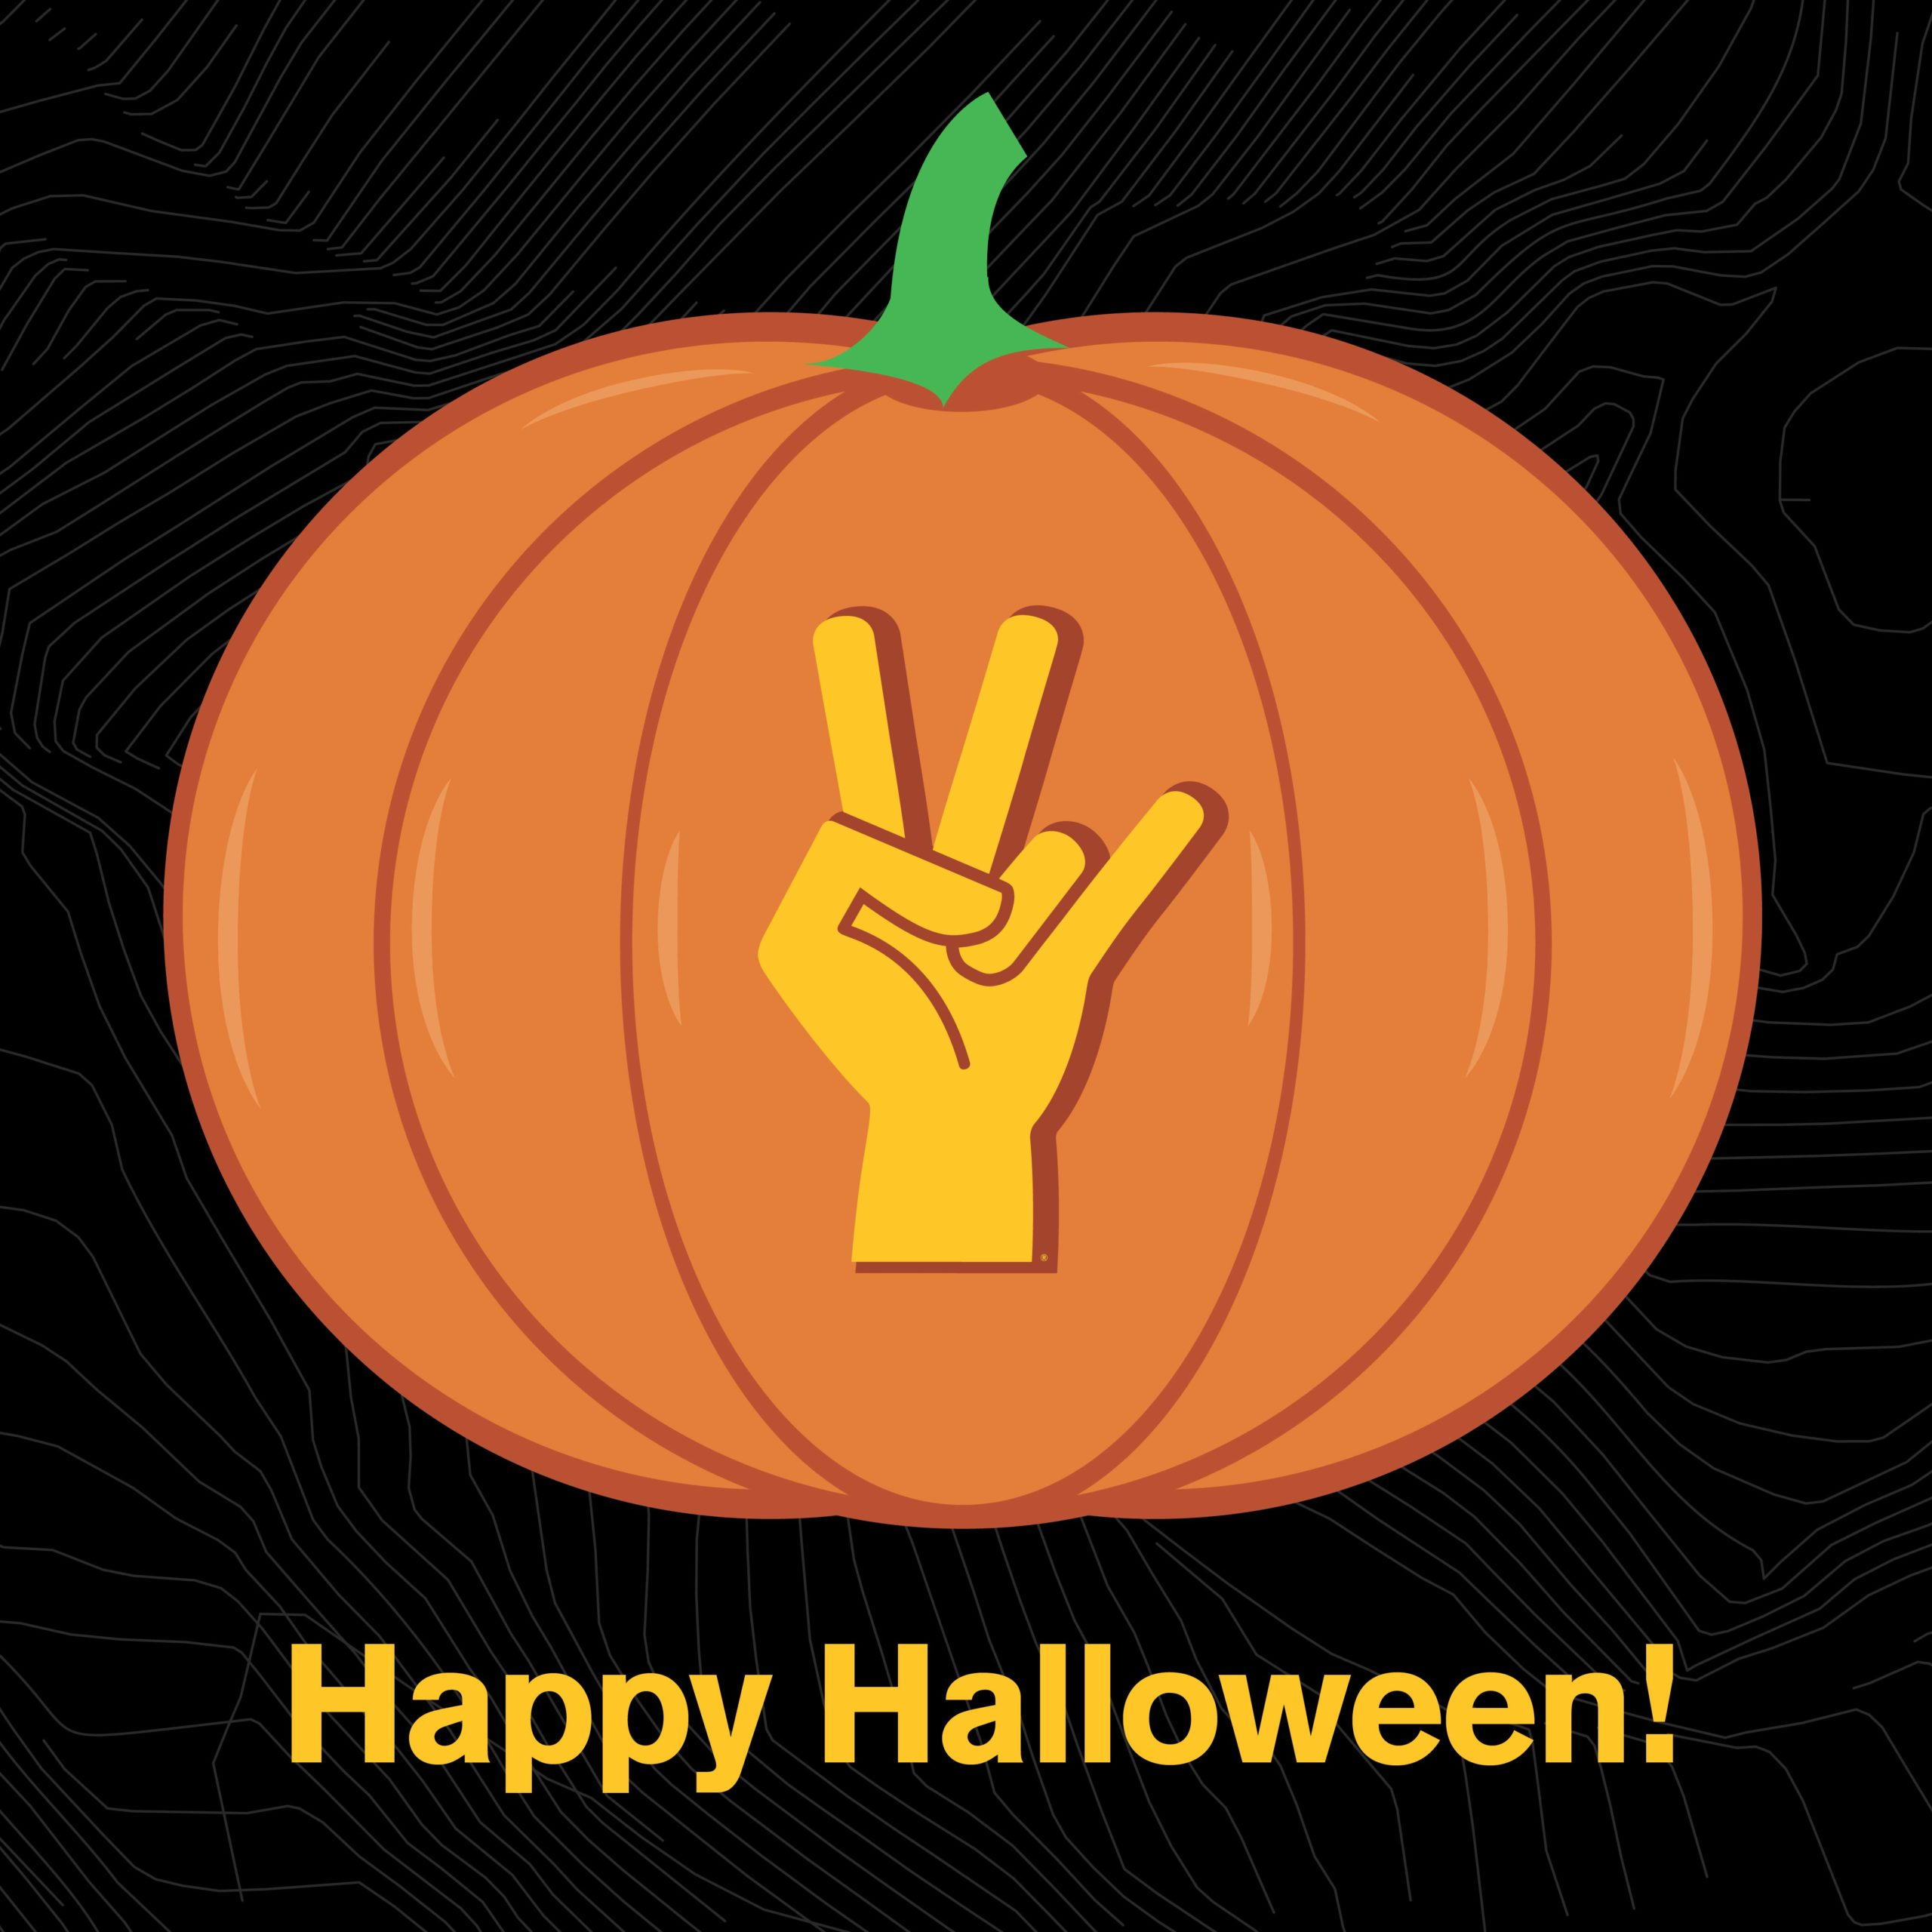 201001-ASU-Digital-Image-Requests-Halloween-v6-2-Final